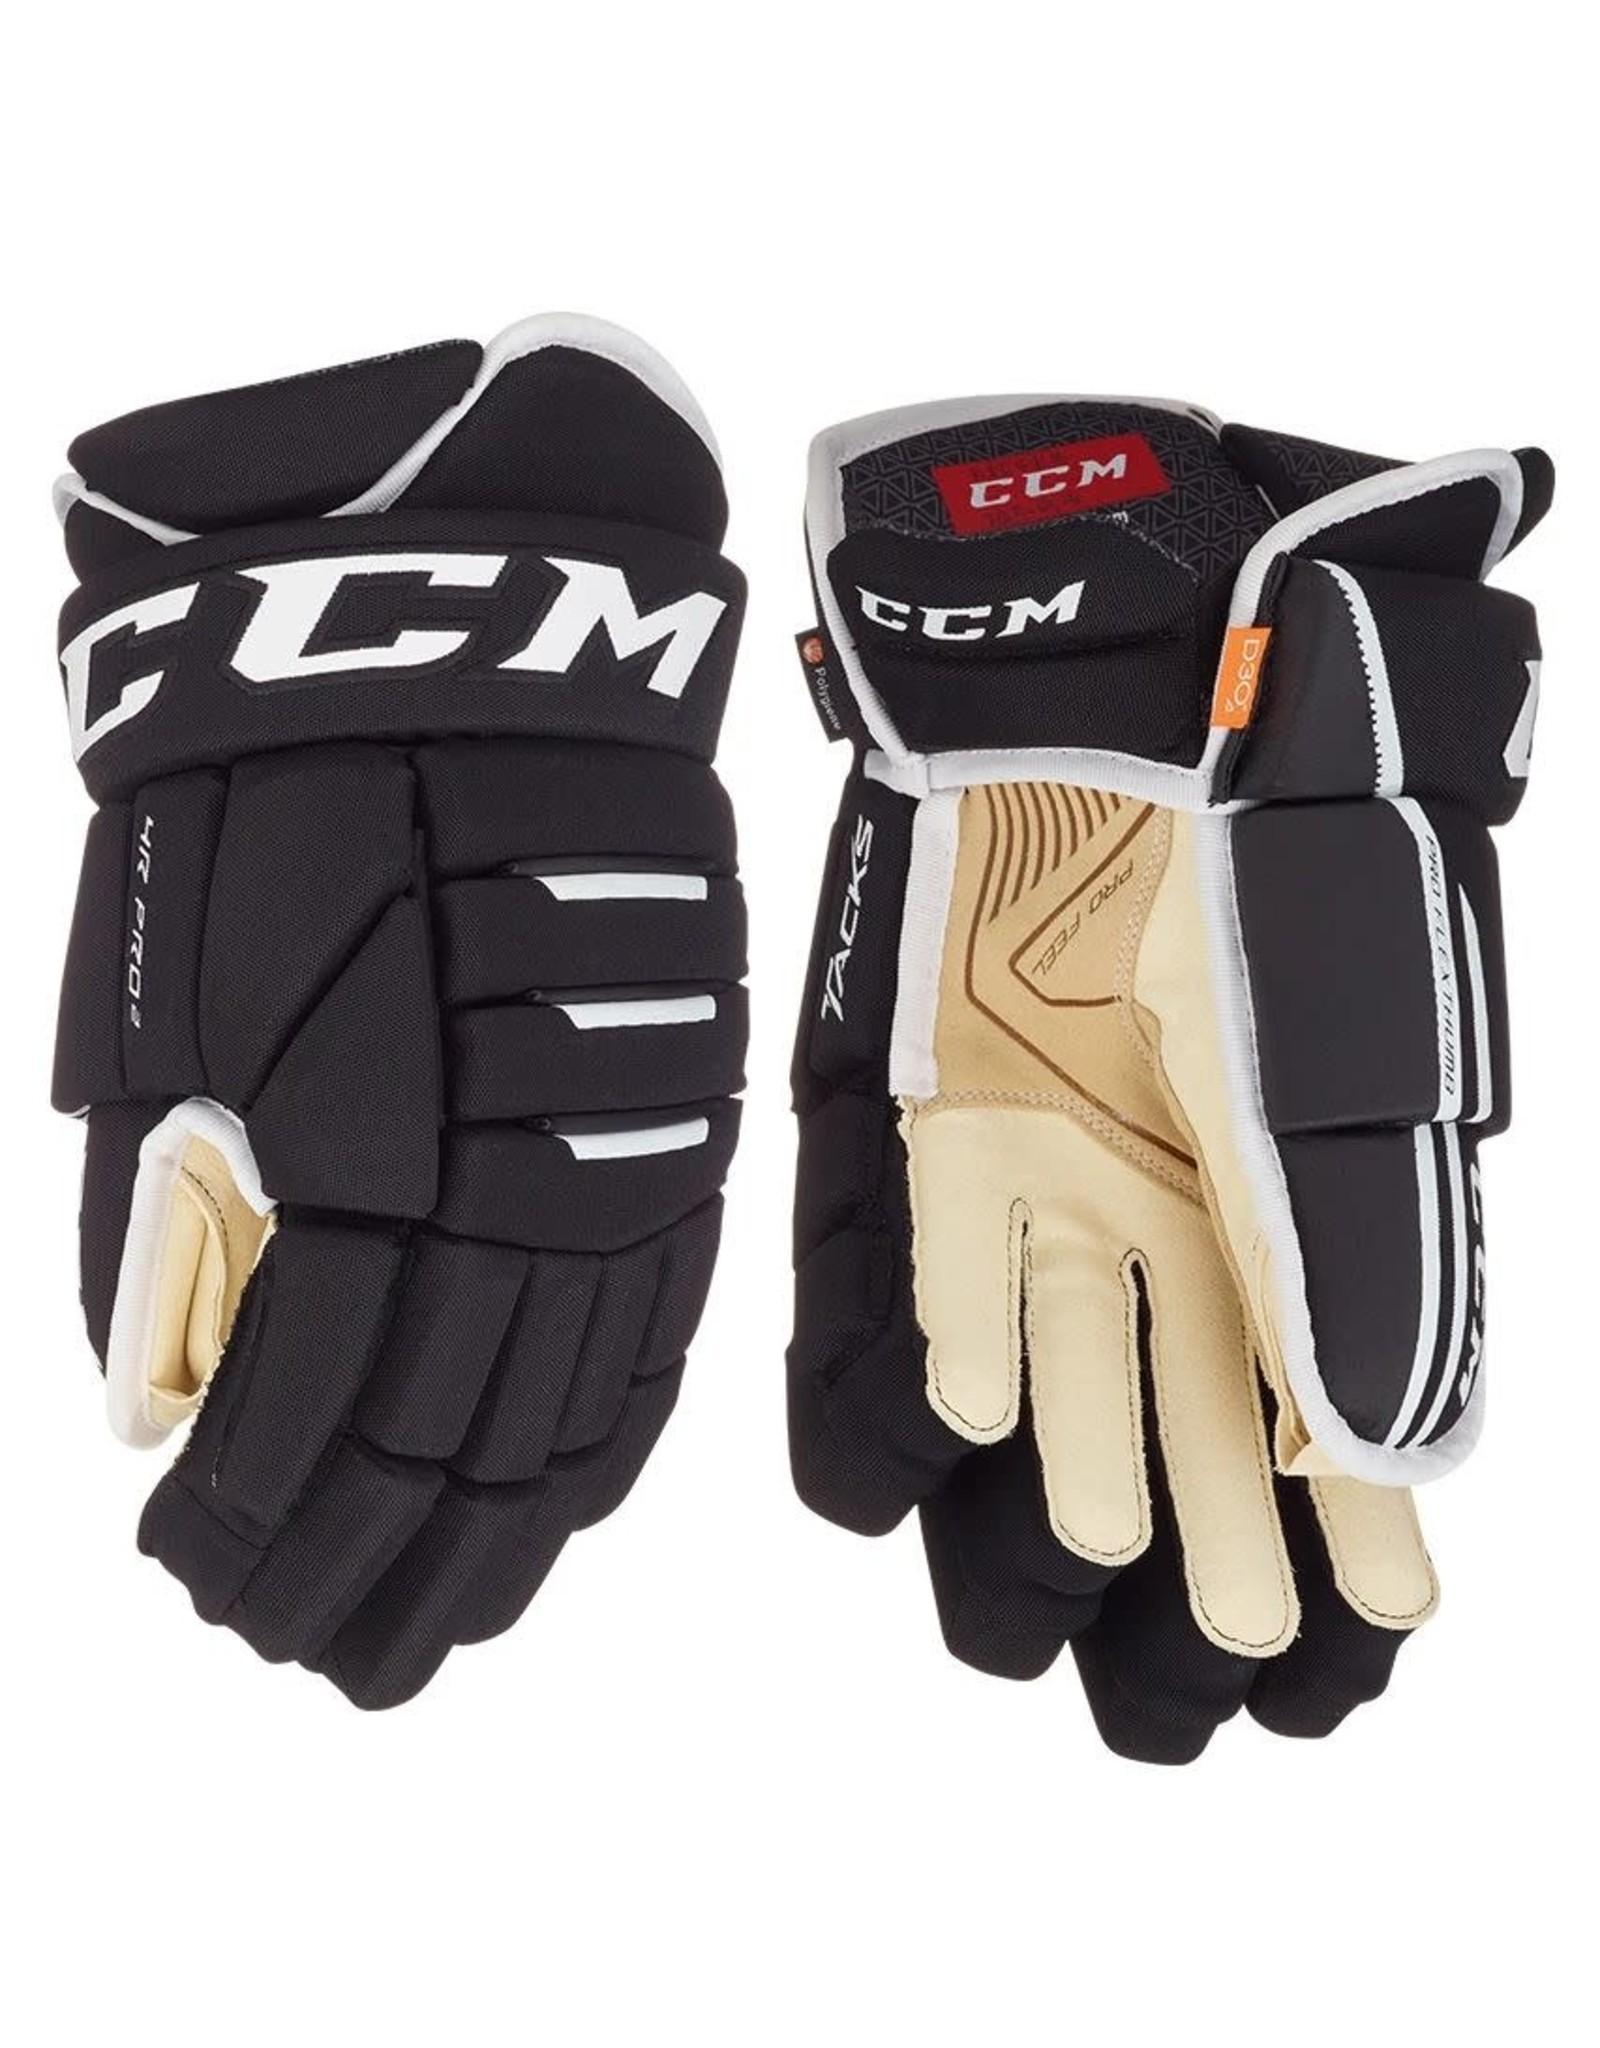 CCM Tacks 4 Roll Pro 2, Senior Hockey Gloves